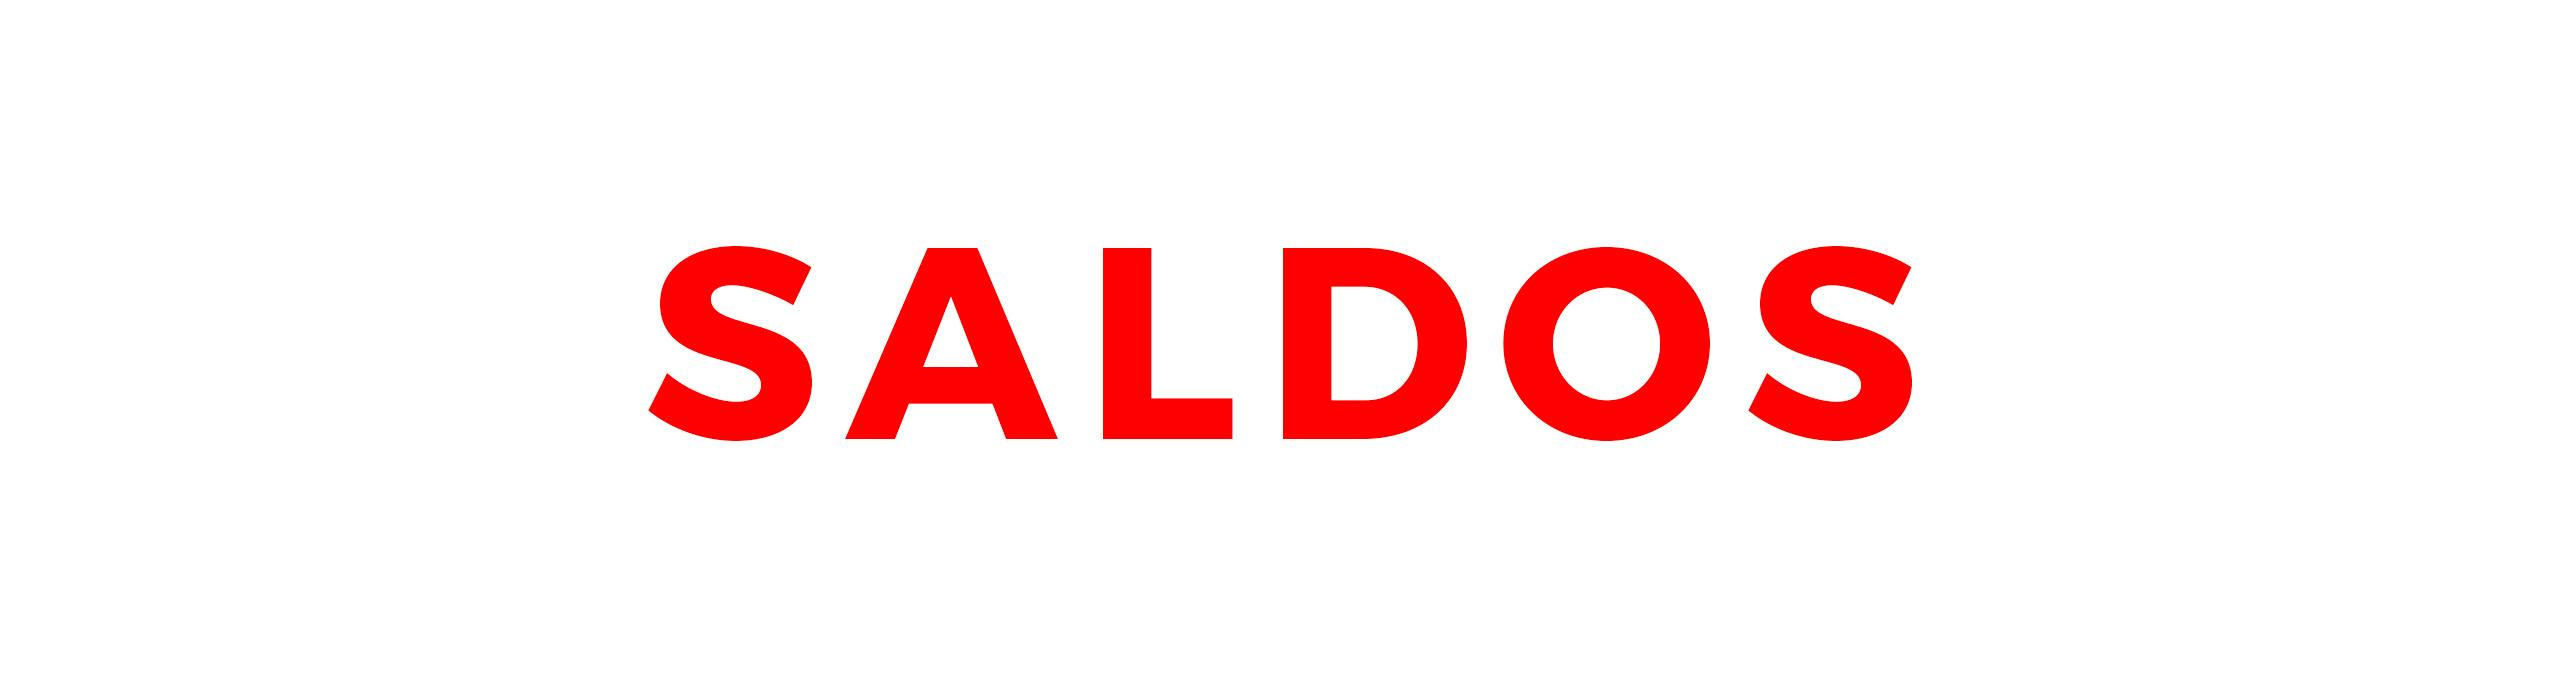 SALDOS